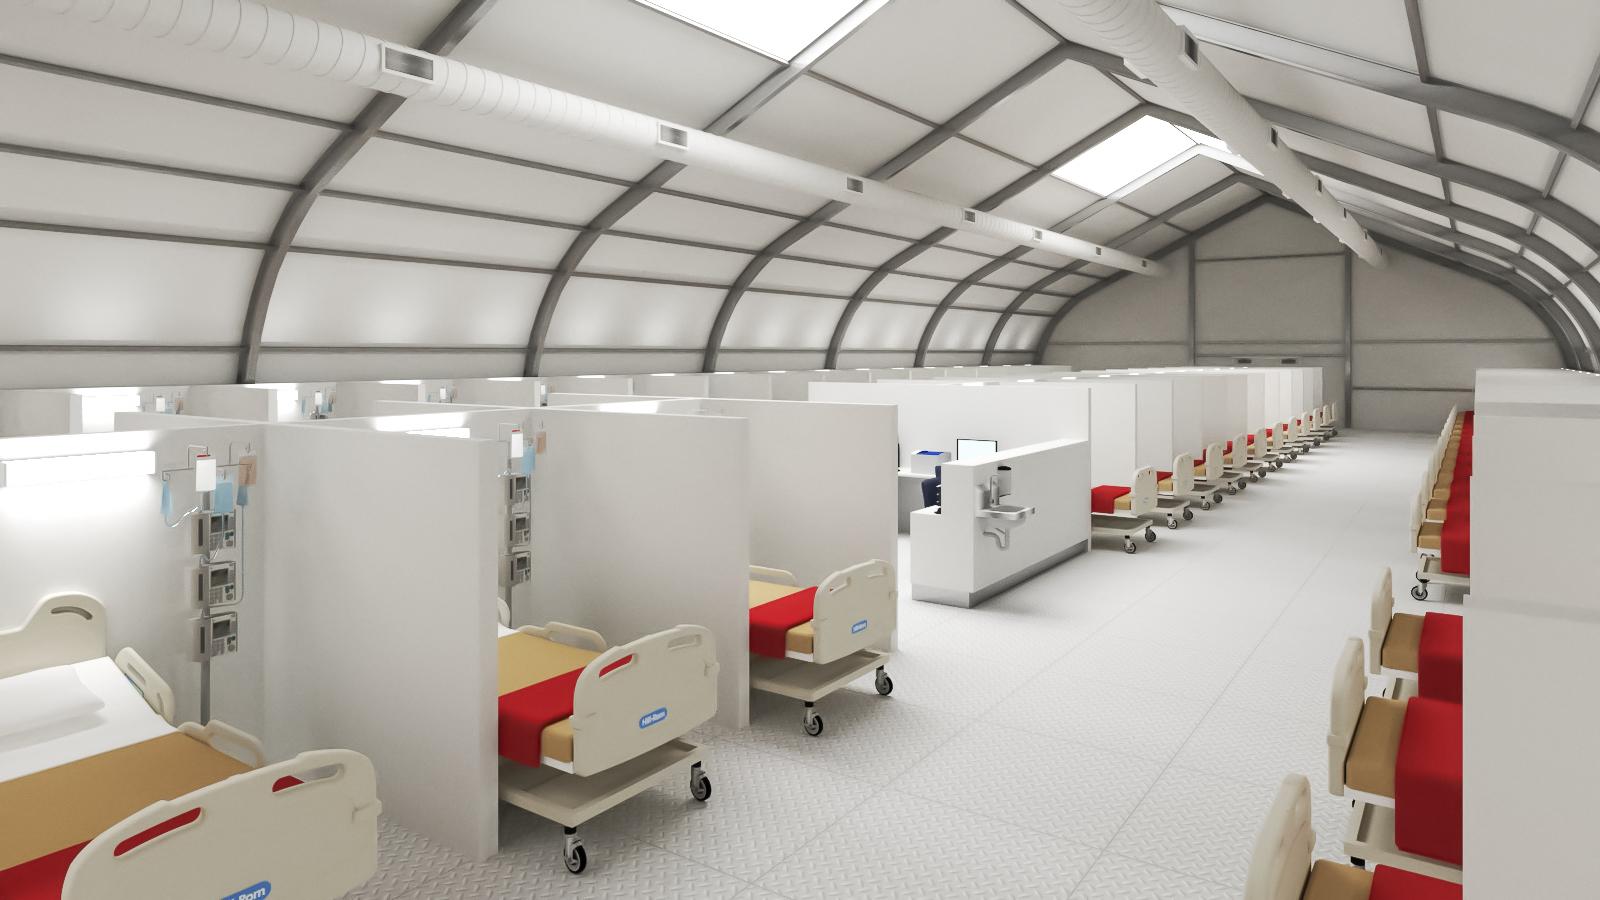 Temporary structure - interim hospital facilities